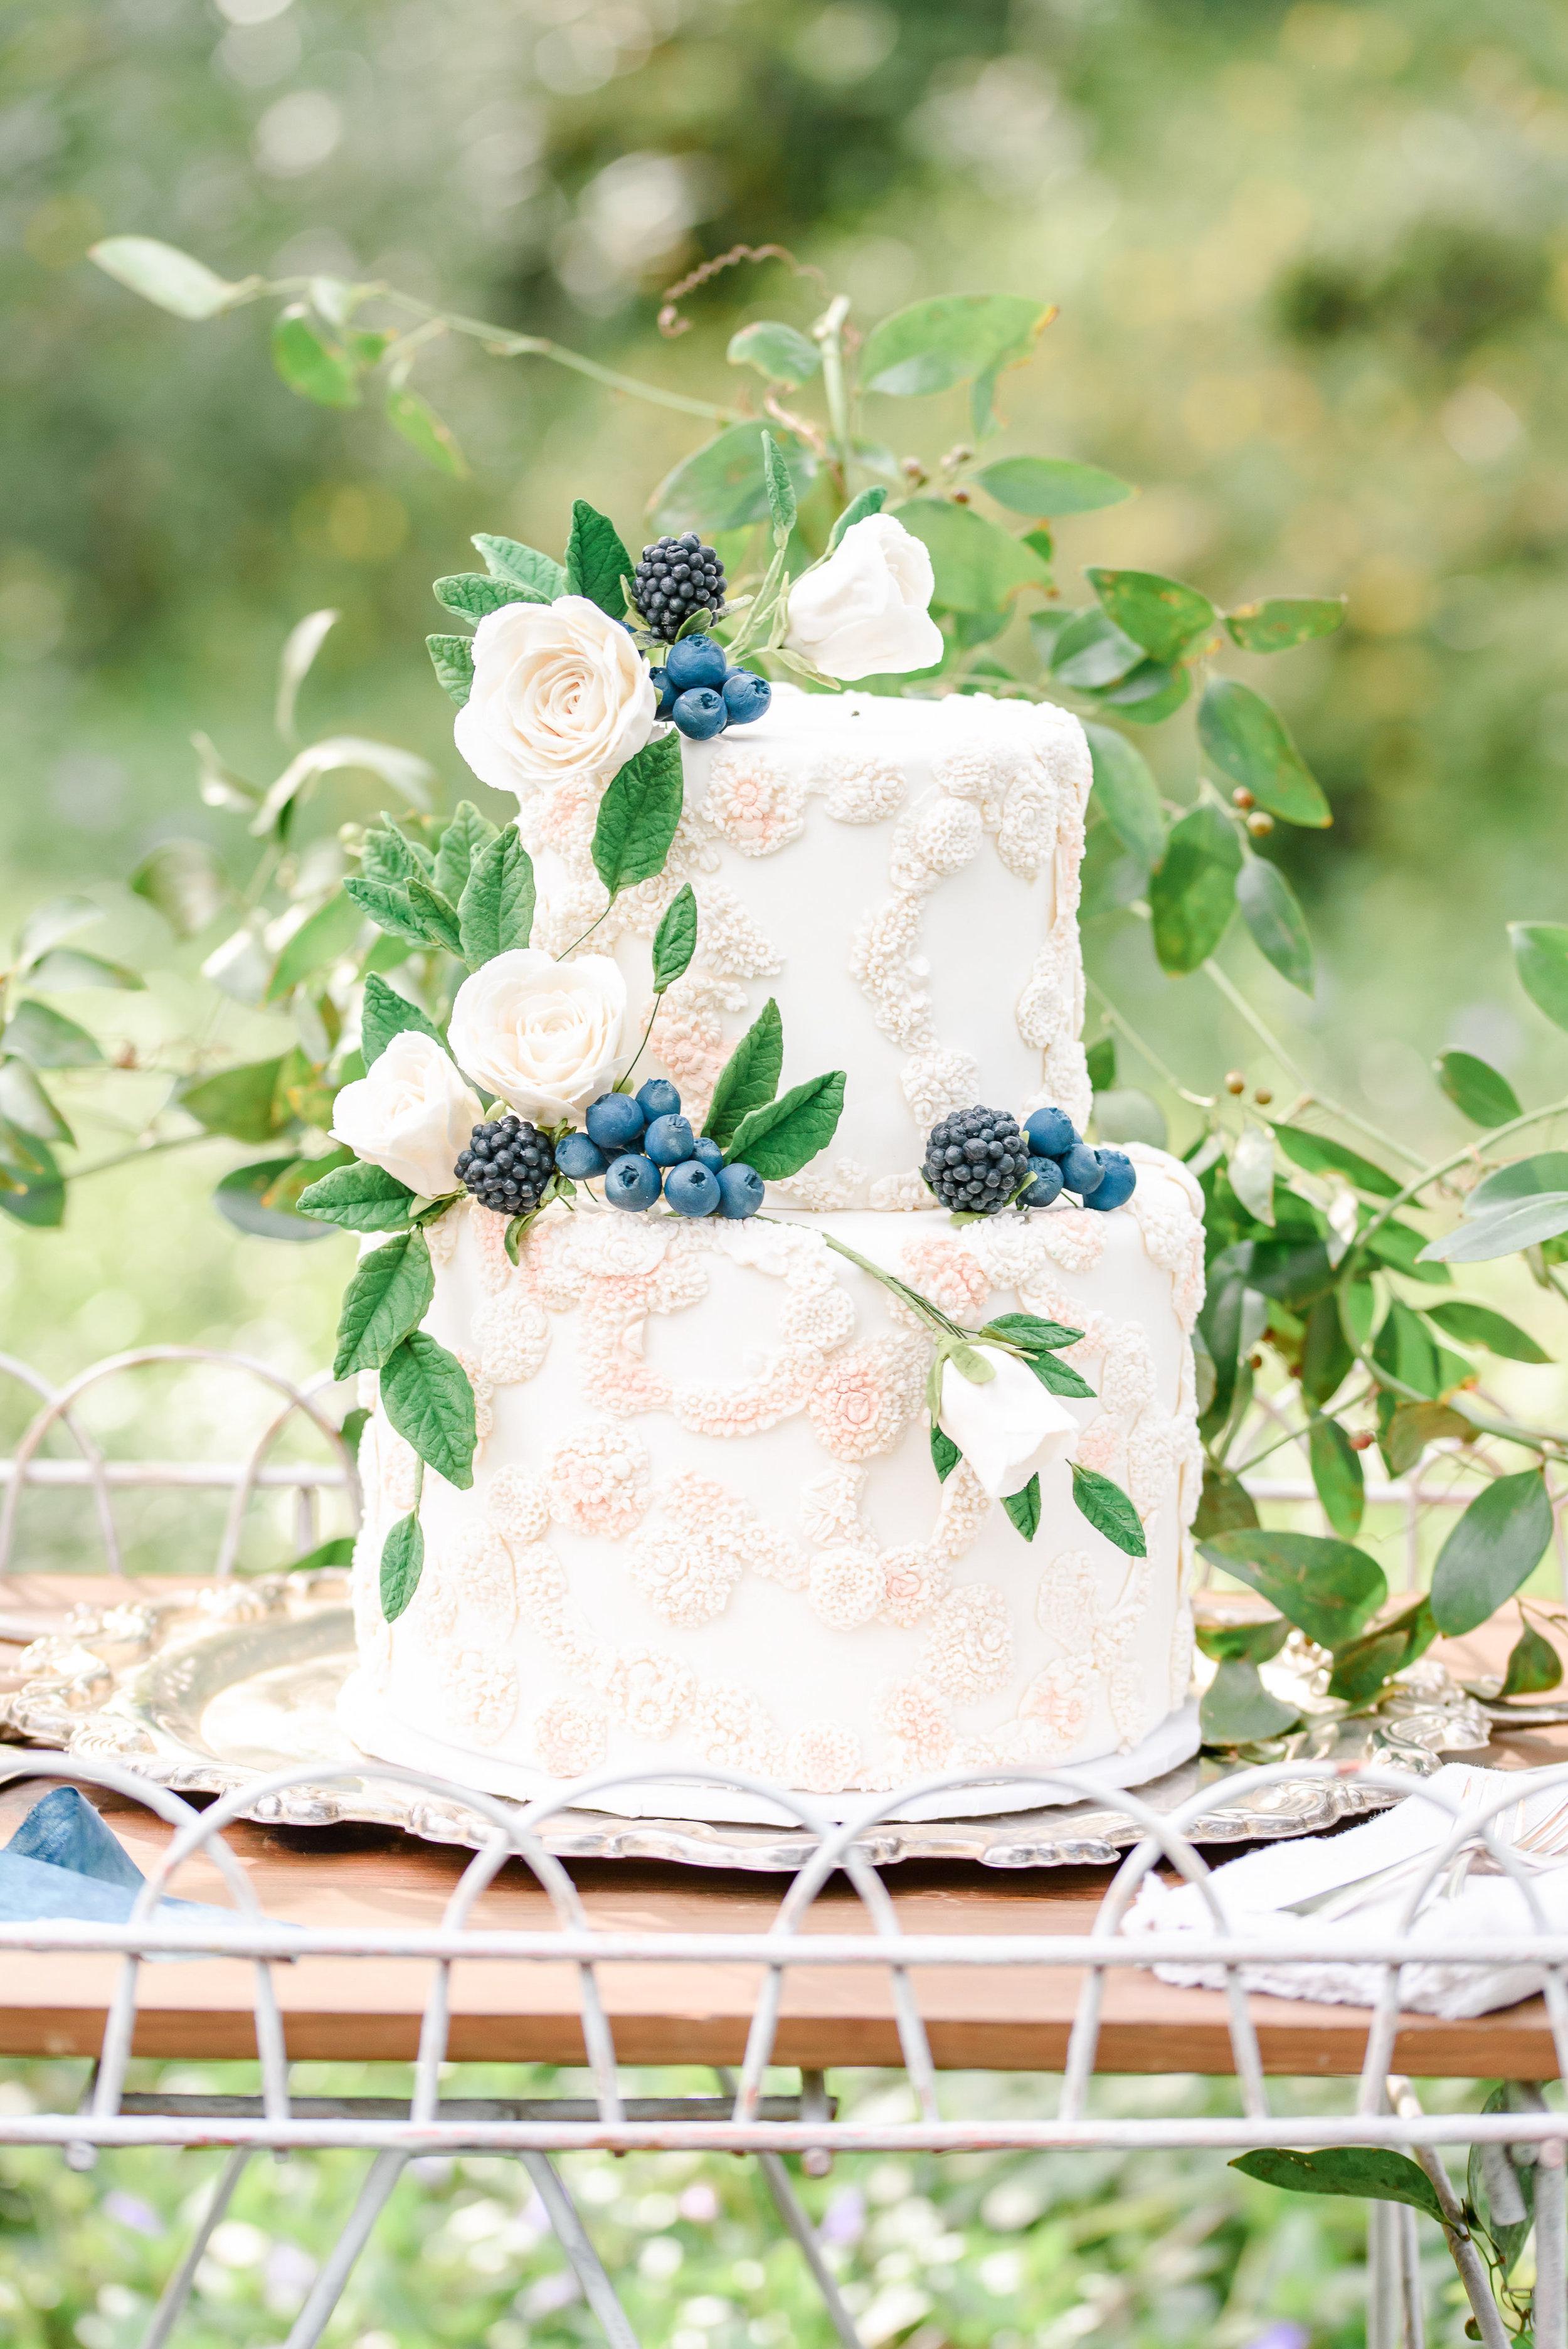 Garden Wedding Inspiration | Wedding Cake | Two-tier wedding cake